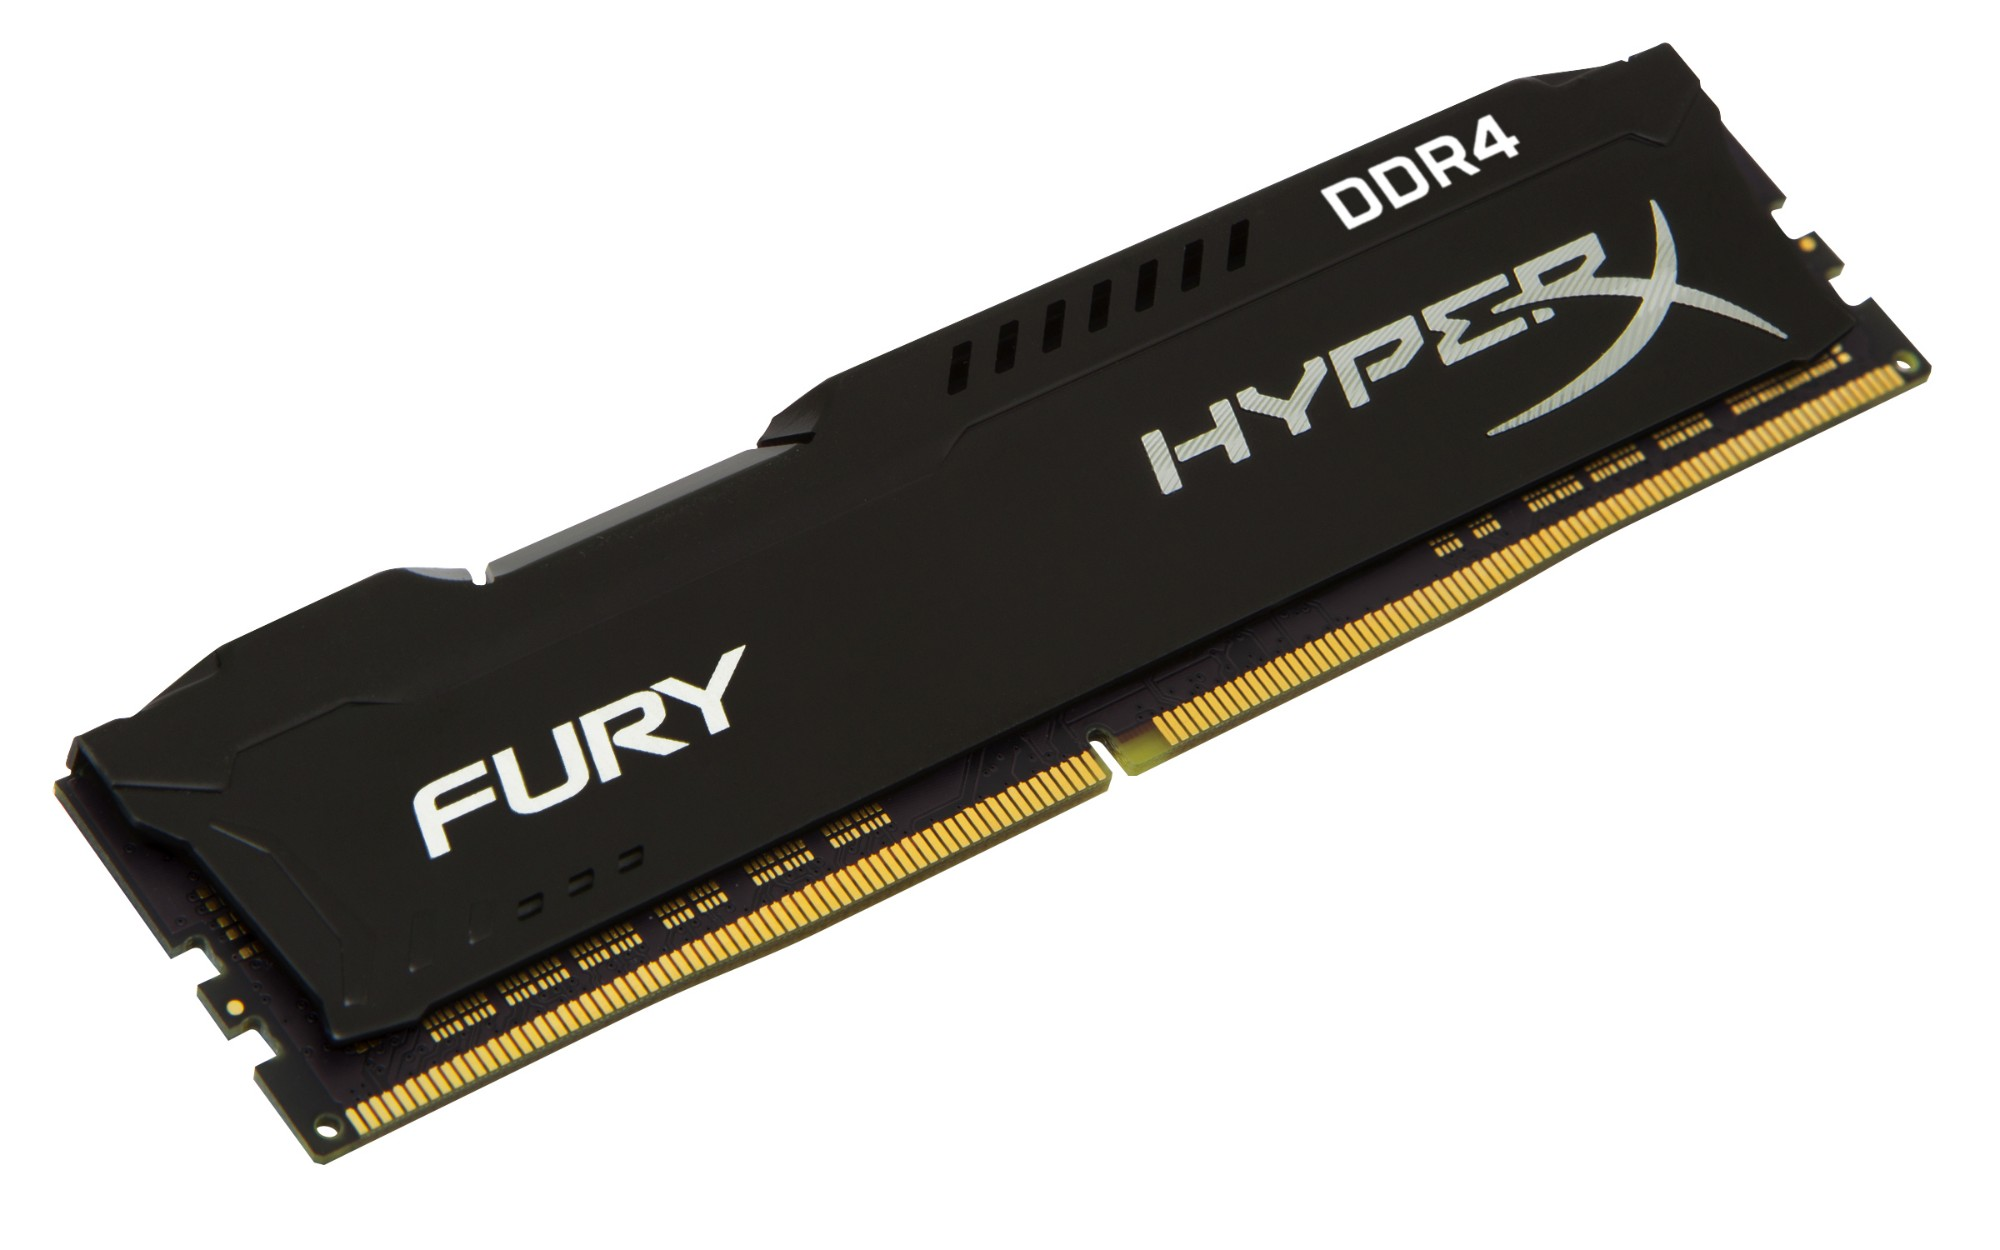 HyperX FURY Memory Black 4GB DDR4 2400MHz memory module